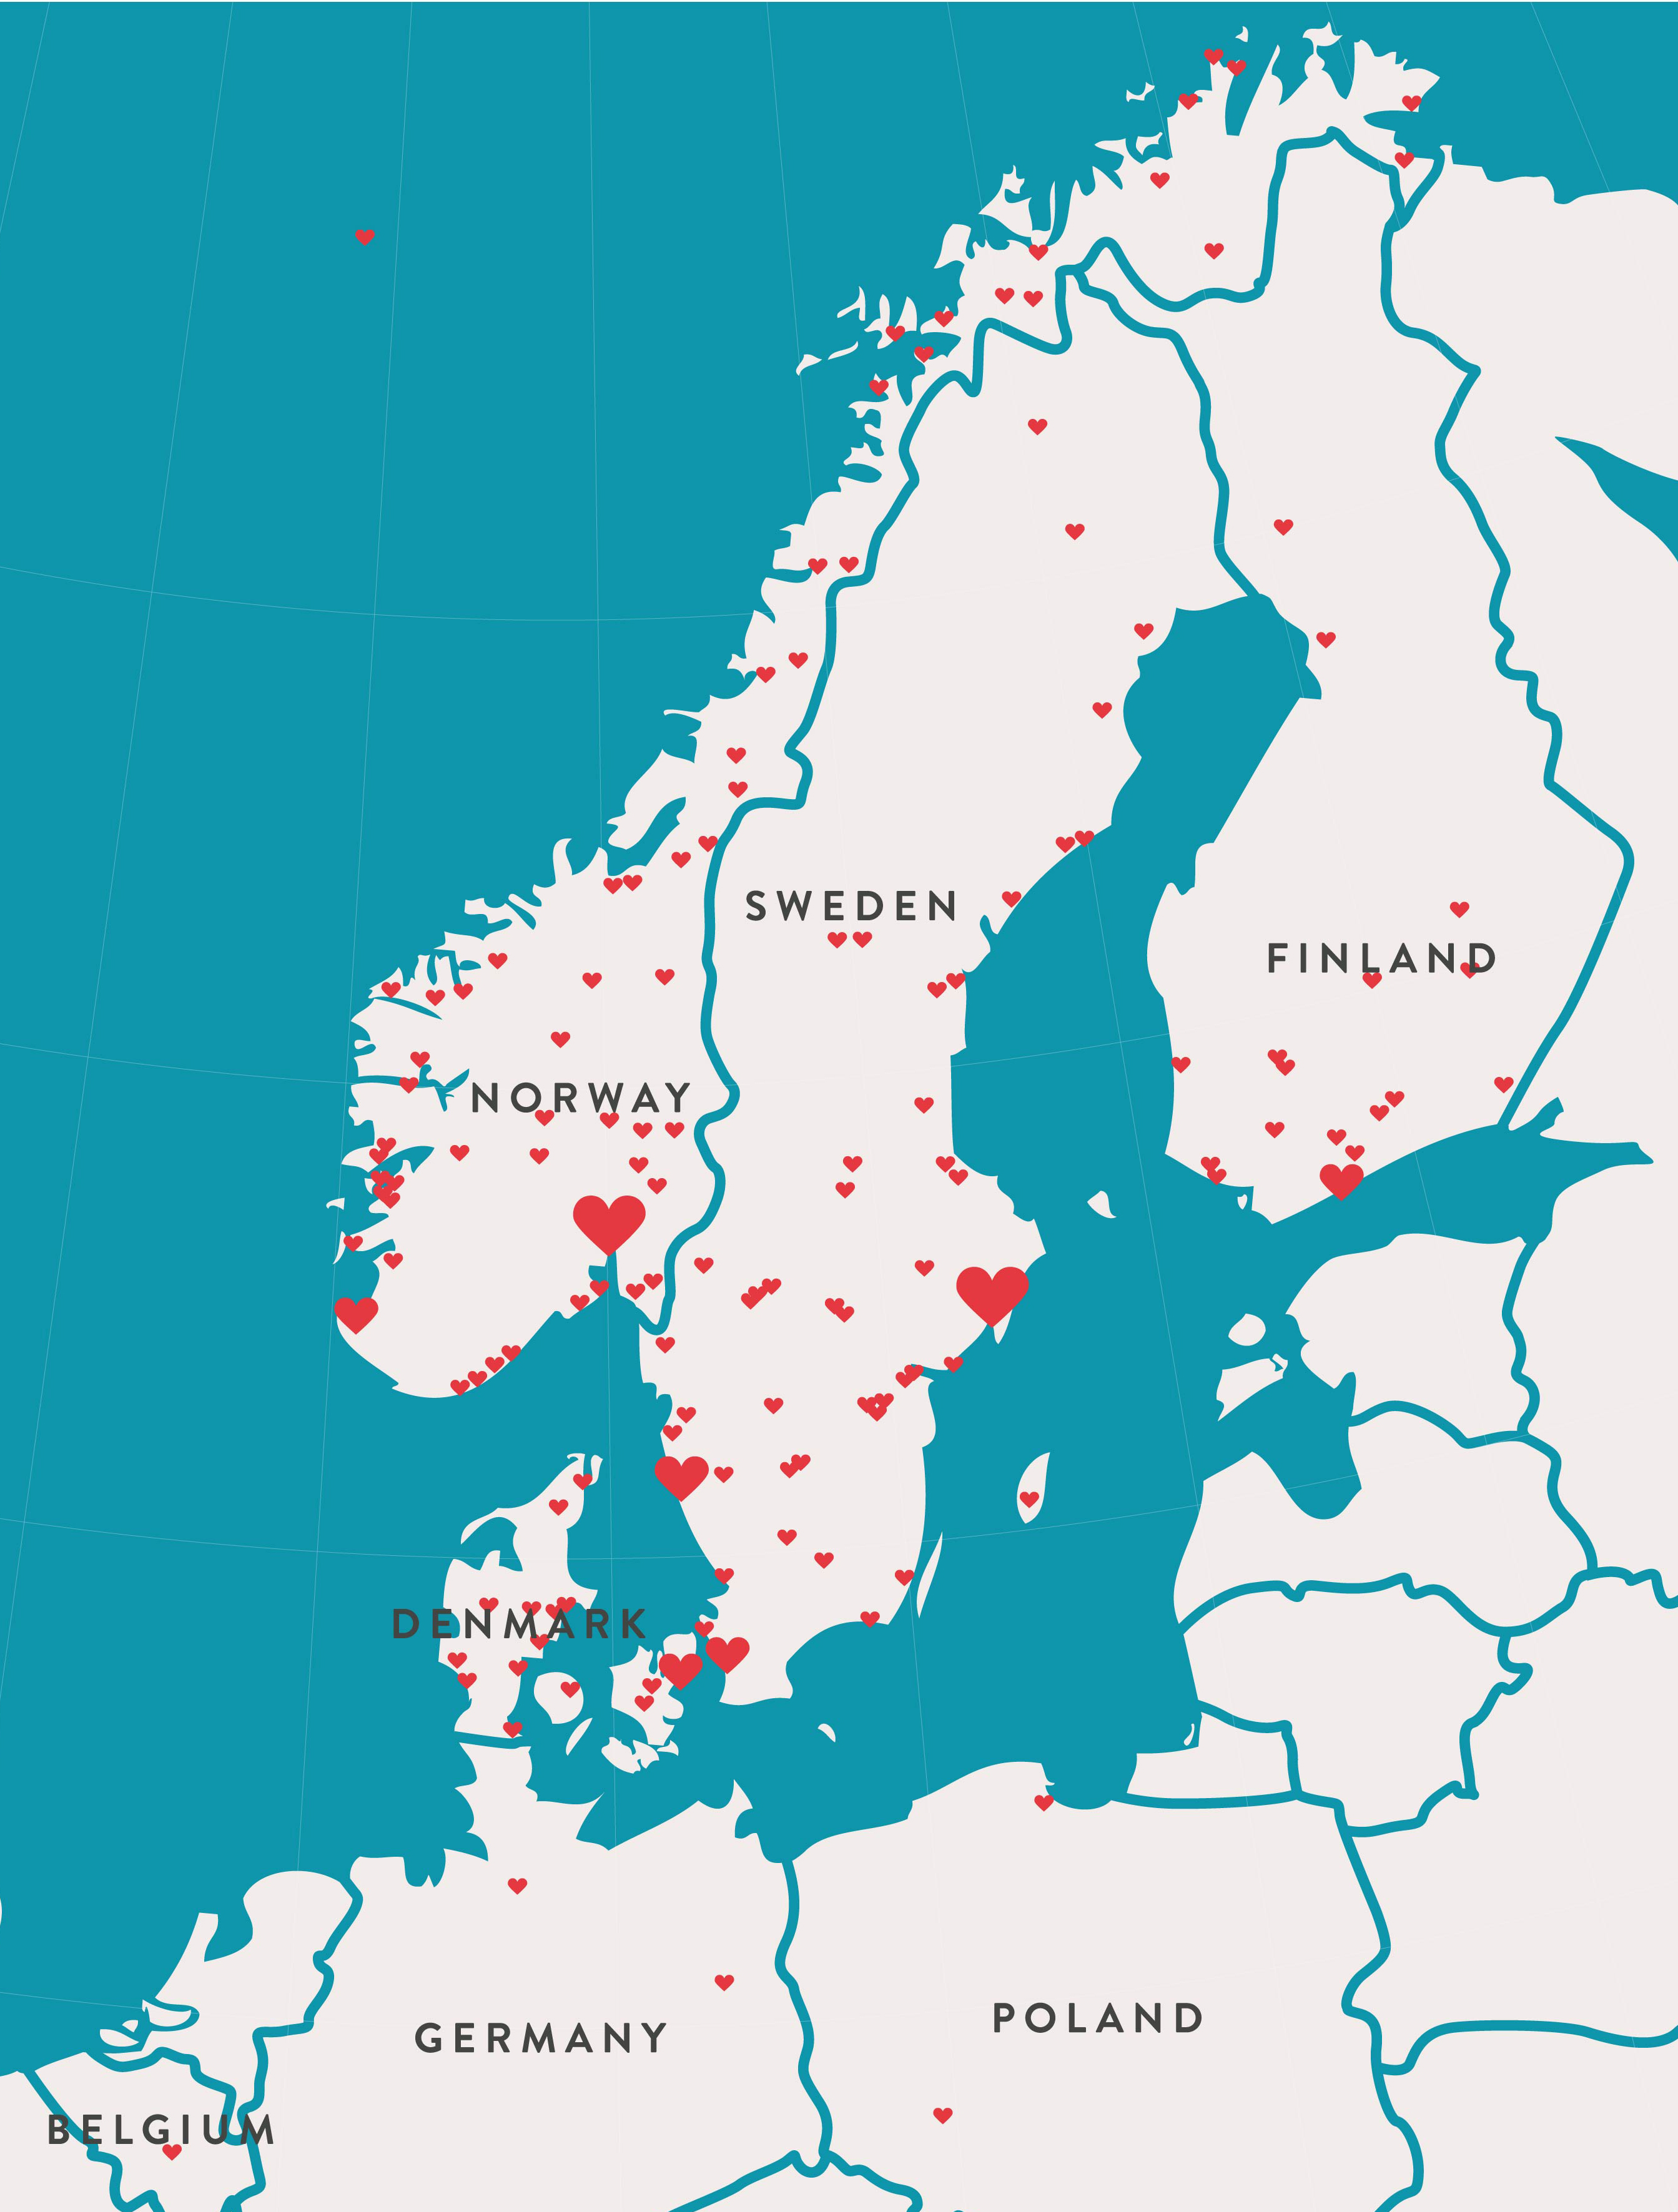 scandic göteborg karta Life In Mind | Vi åker på turné med Scandic scandic göteborg karta